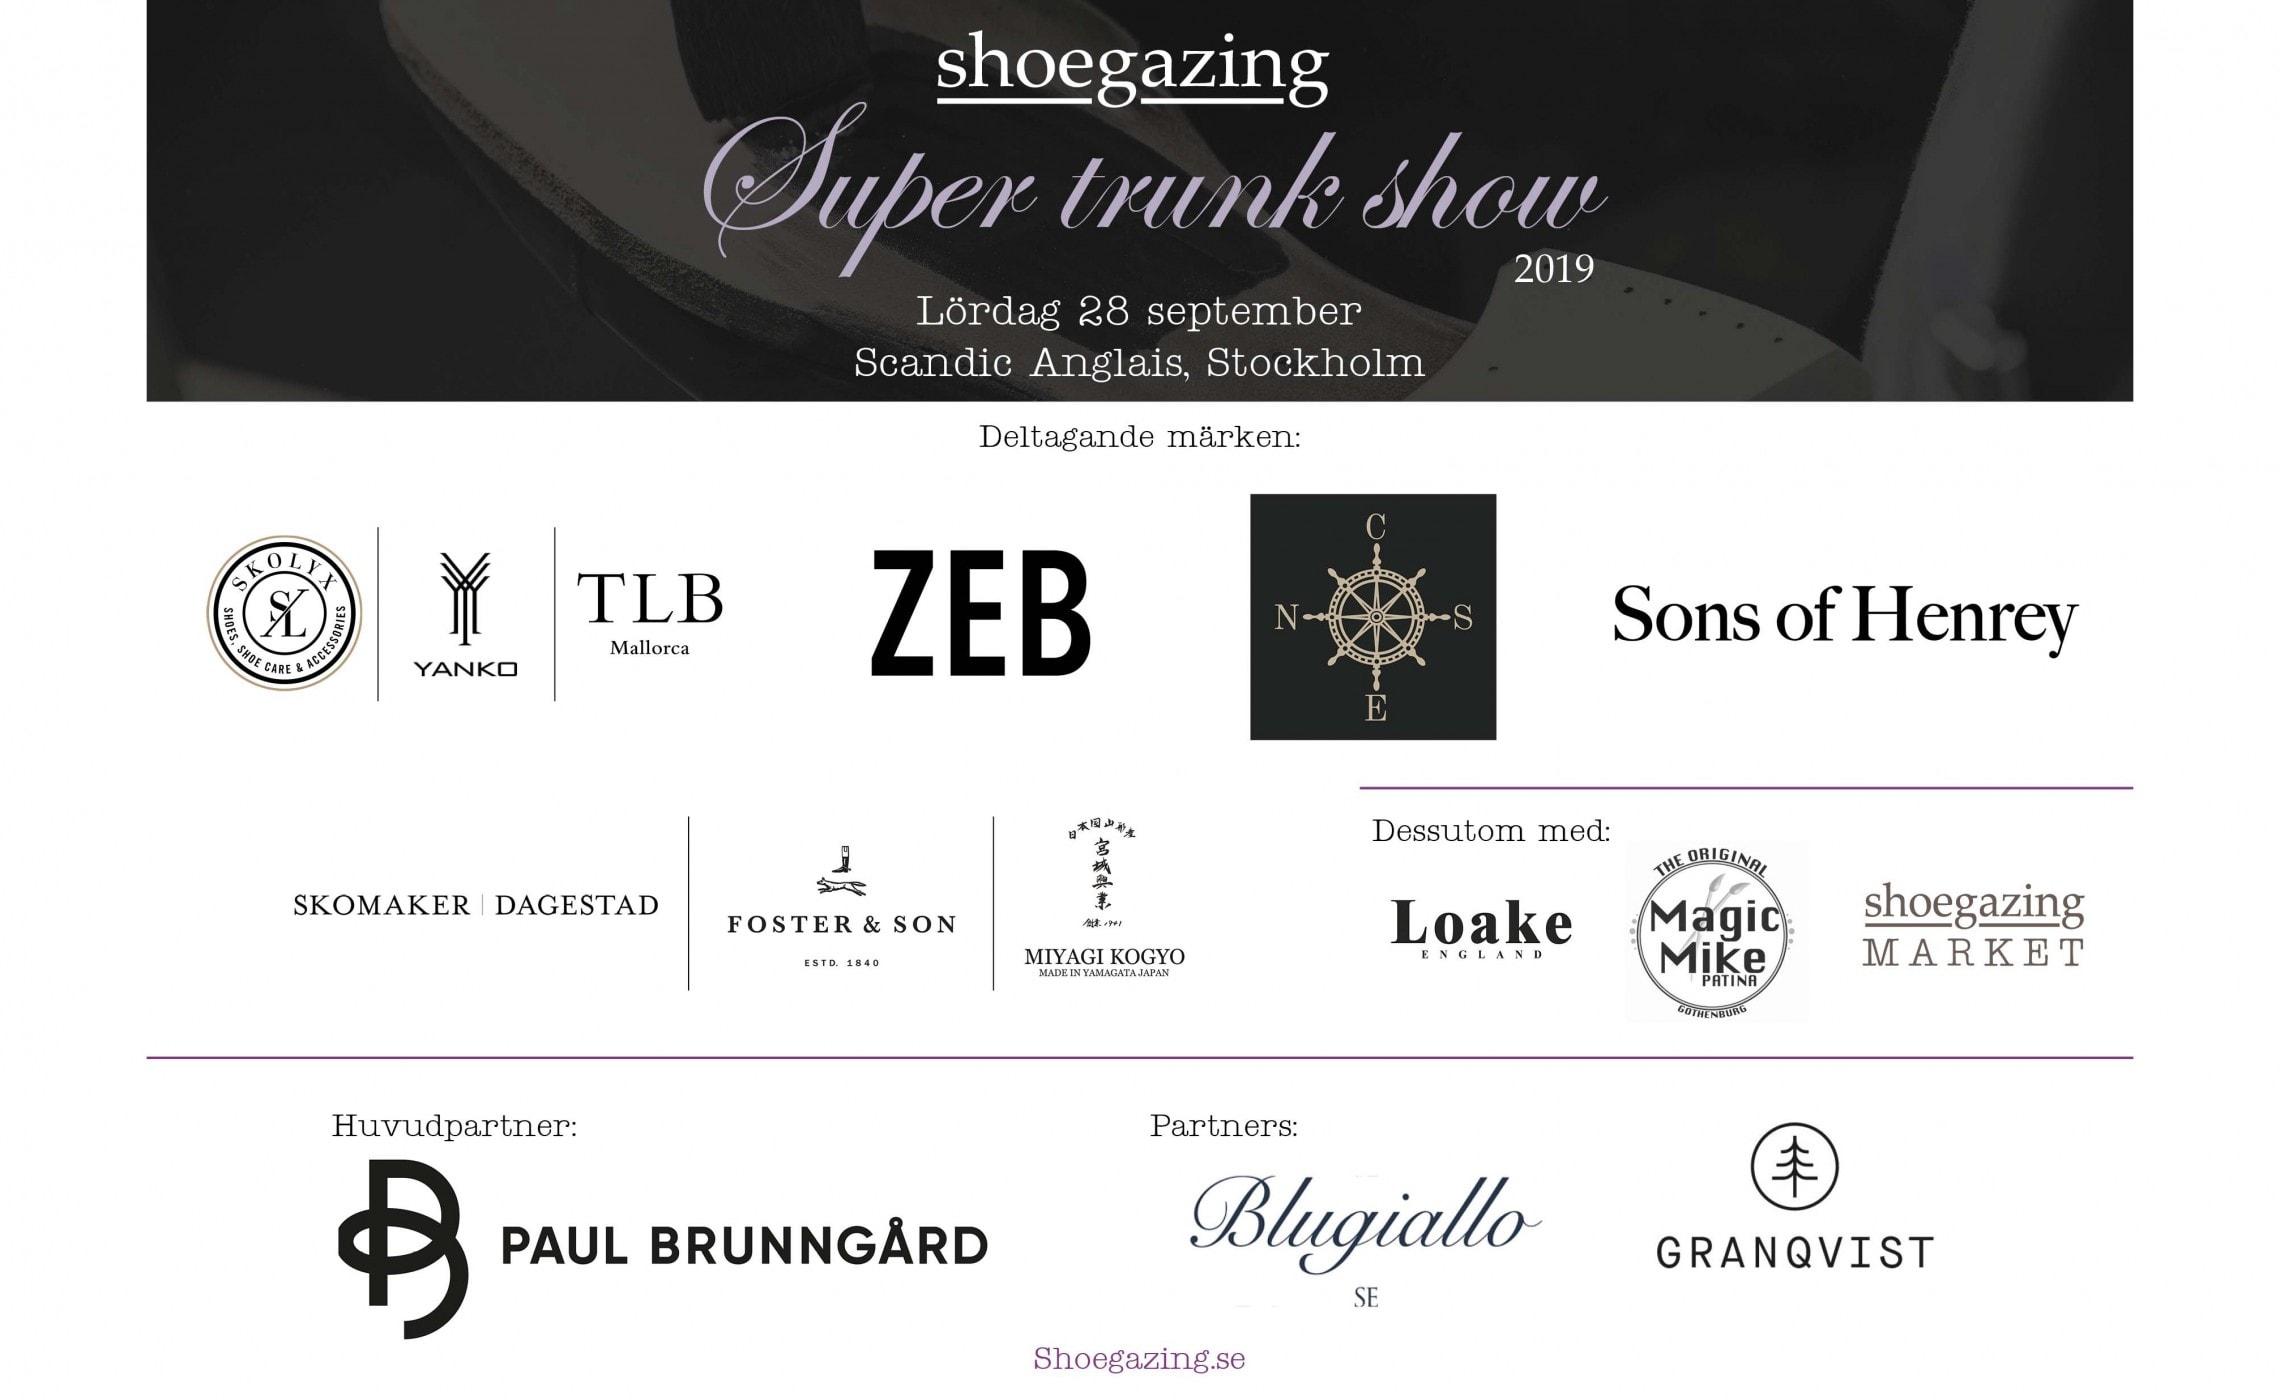 Shoegazing Stockholm Trunk Show 2019